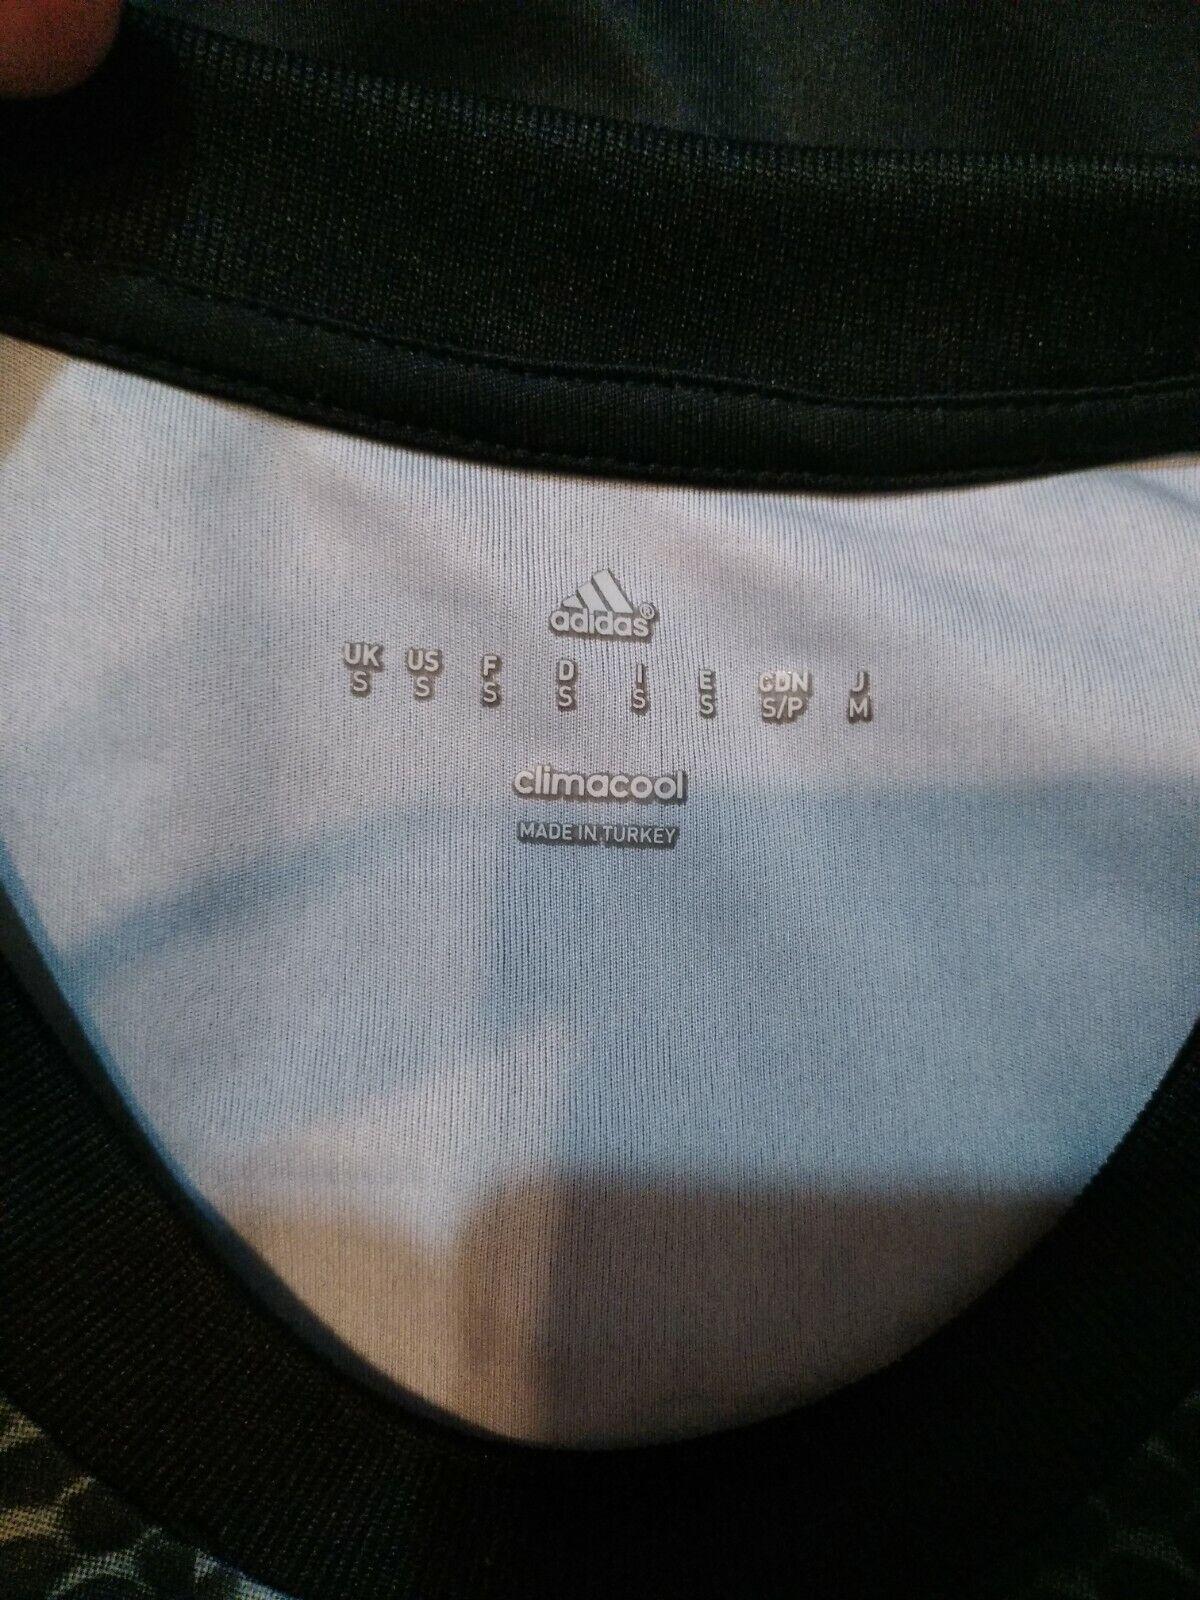 Größe S Besiktas Turkey 2014-2015 2014-2015 2014-2015 Adidas Formotion Goalkeeper Football Shirt a2f8d6